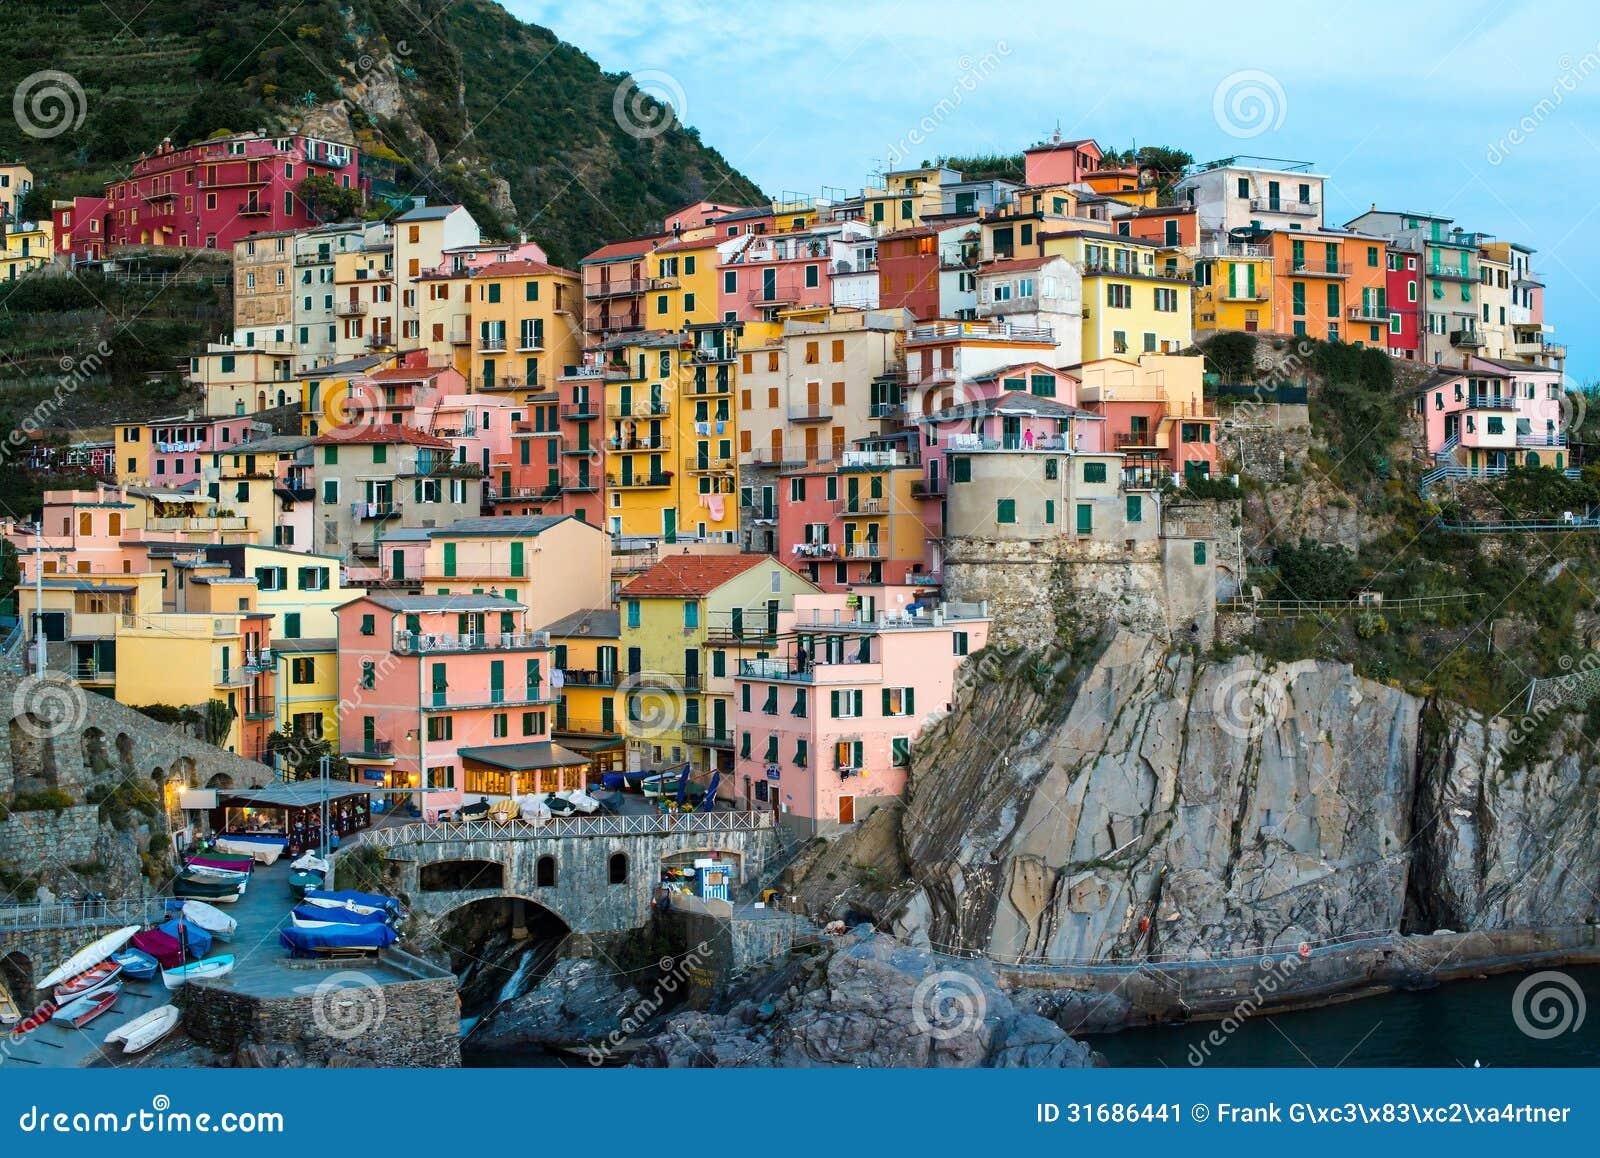 Liguria Tourist Attractions